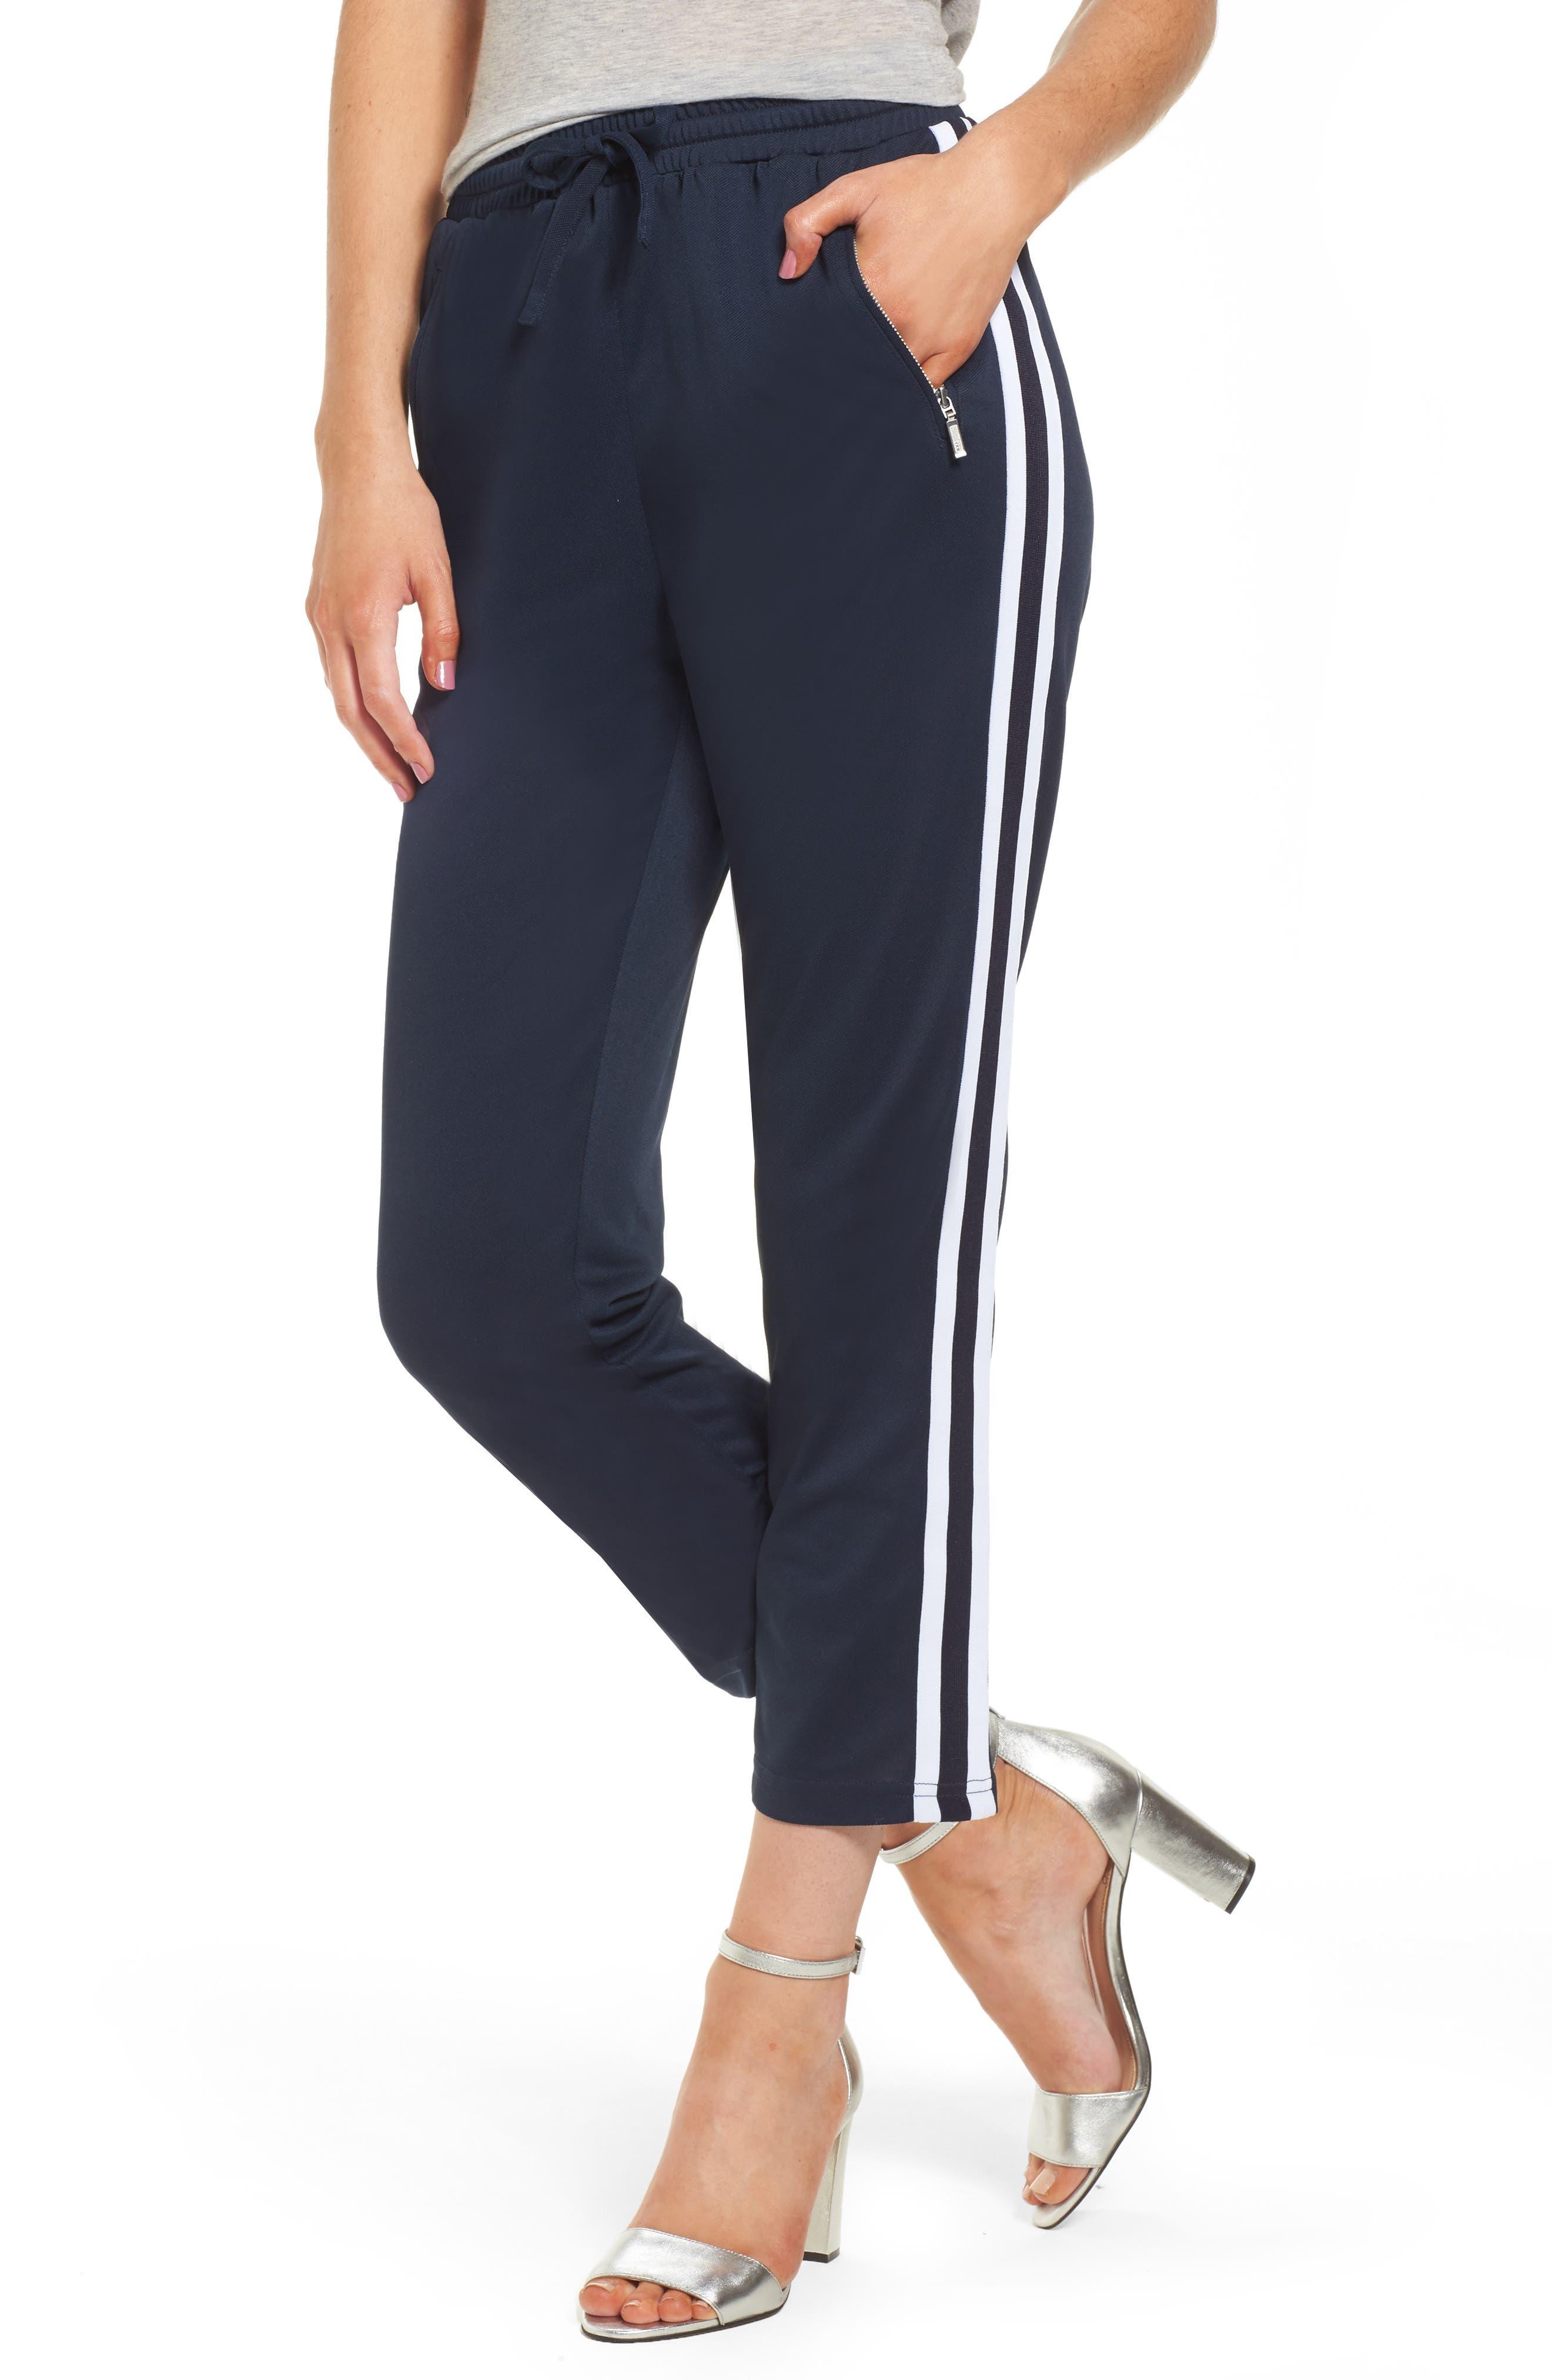 Rebecca Minkoff Jolie Crop Pants